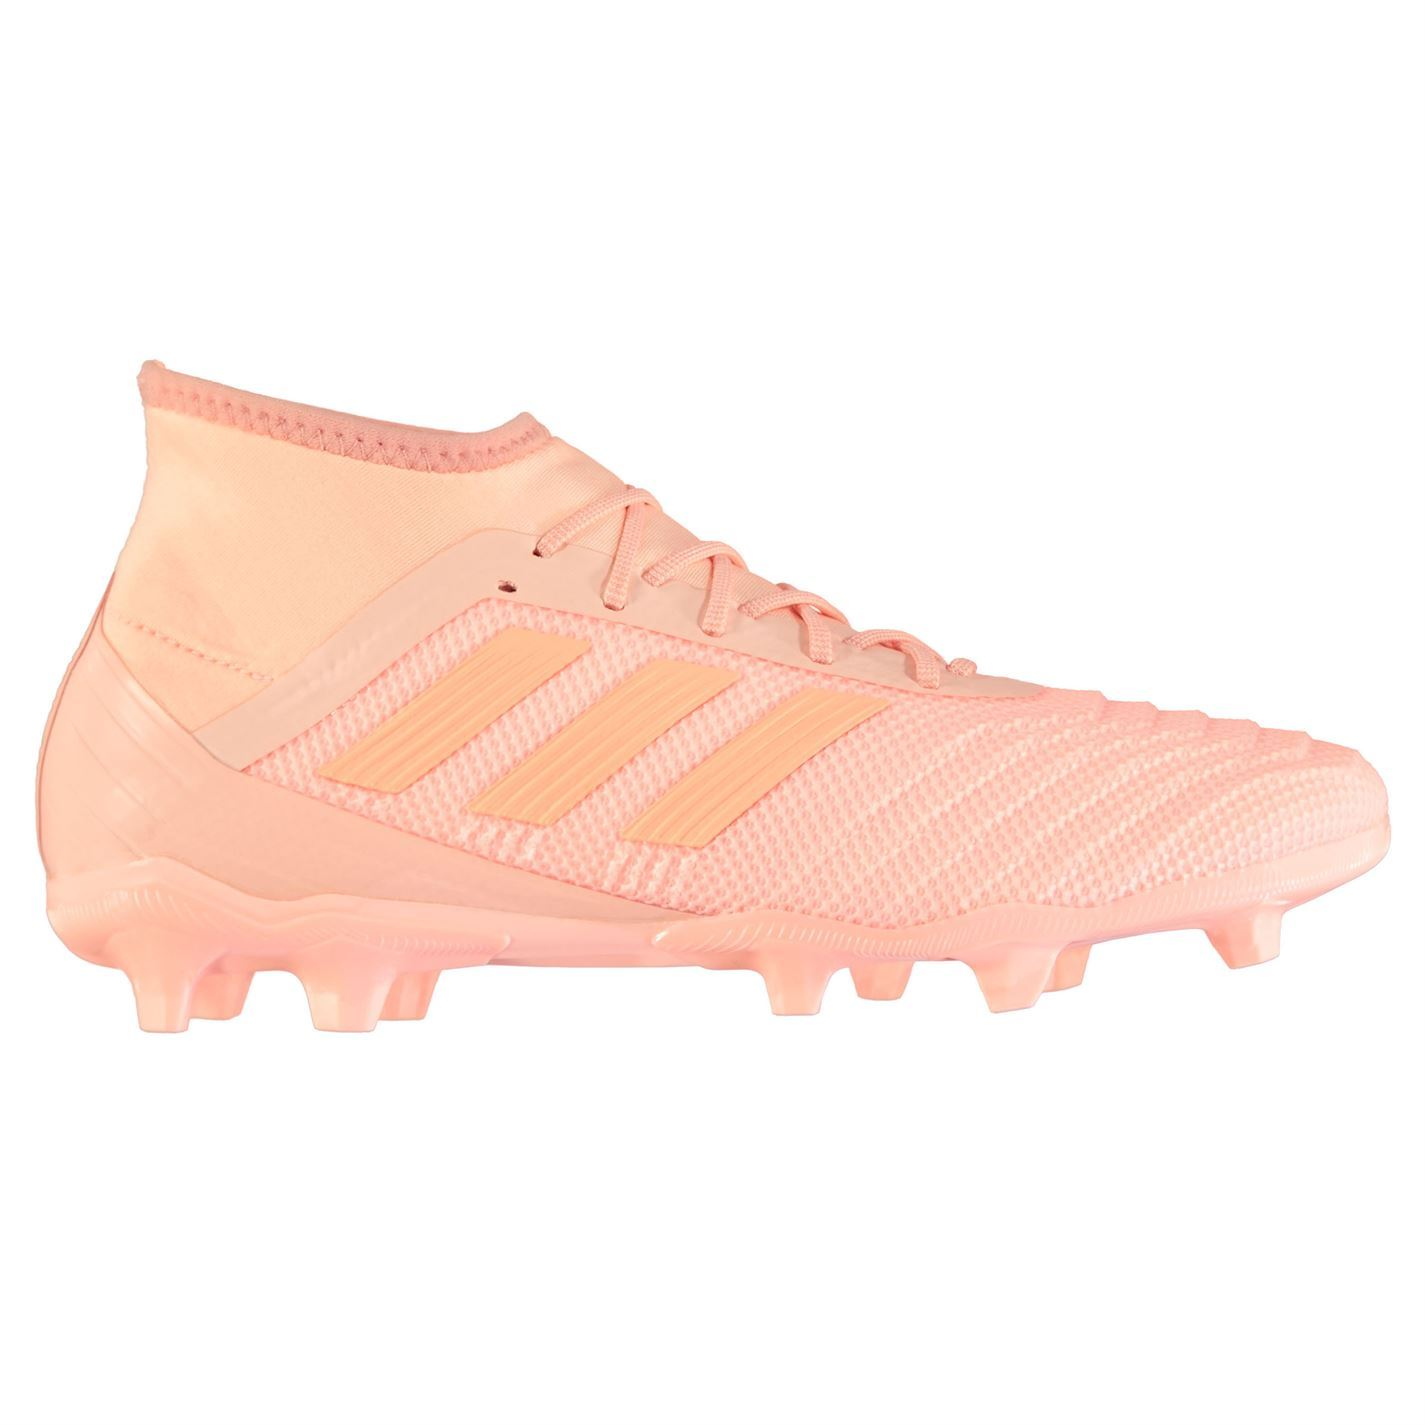 Adidas-Predator-18-2-FG-Firm-Ground-Chaussures-De-Football-Homme-Football-Chaussures-Crampons miniature 5